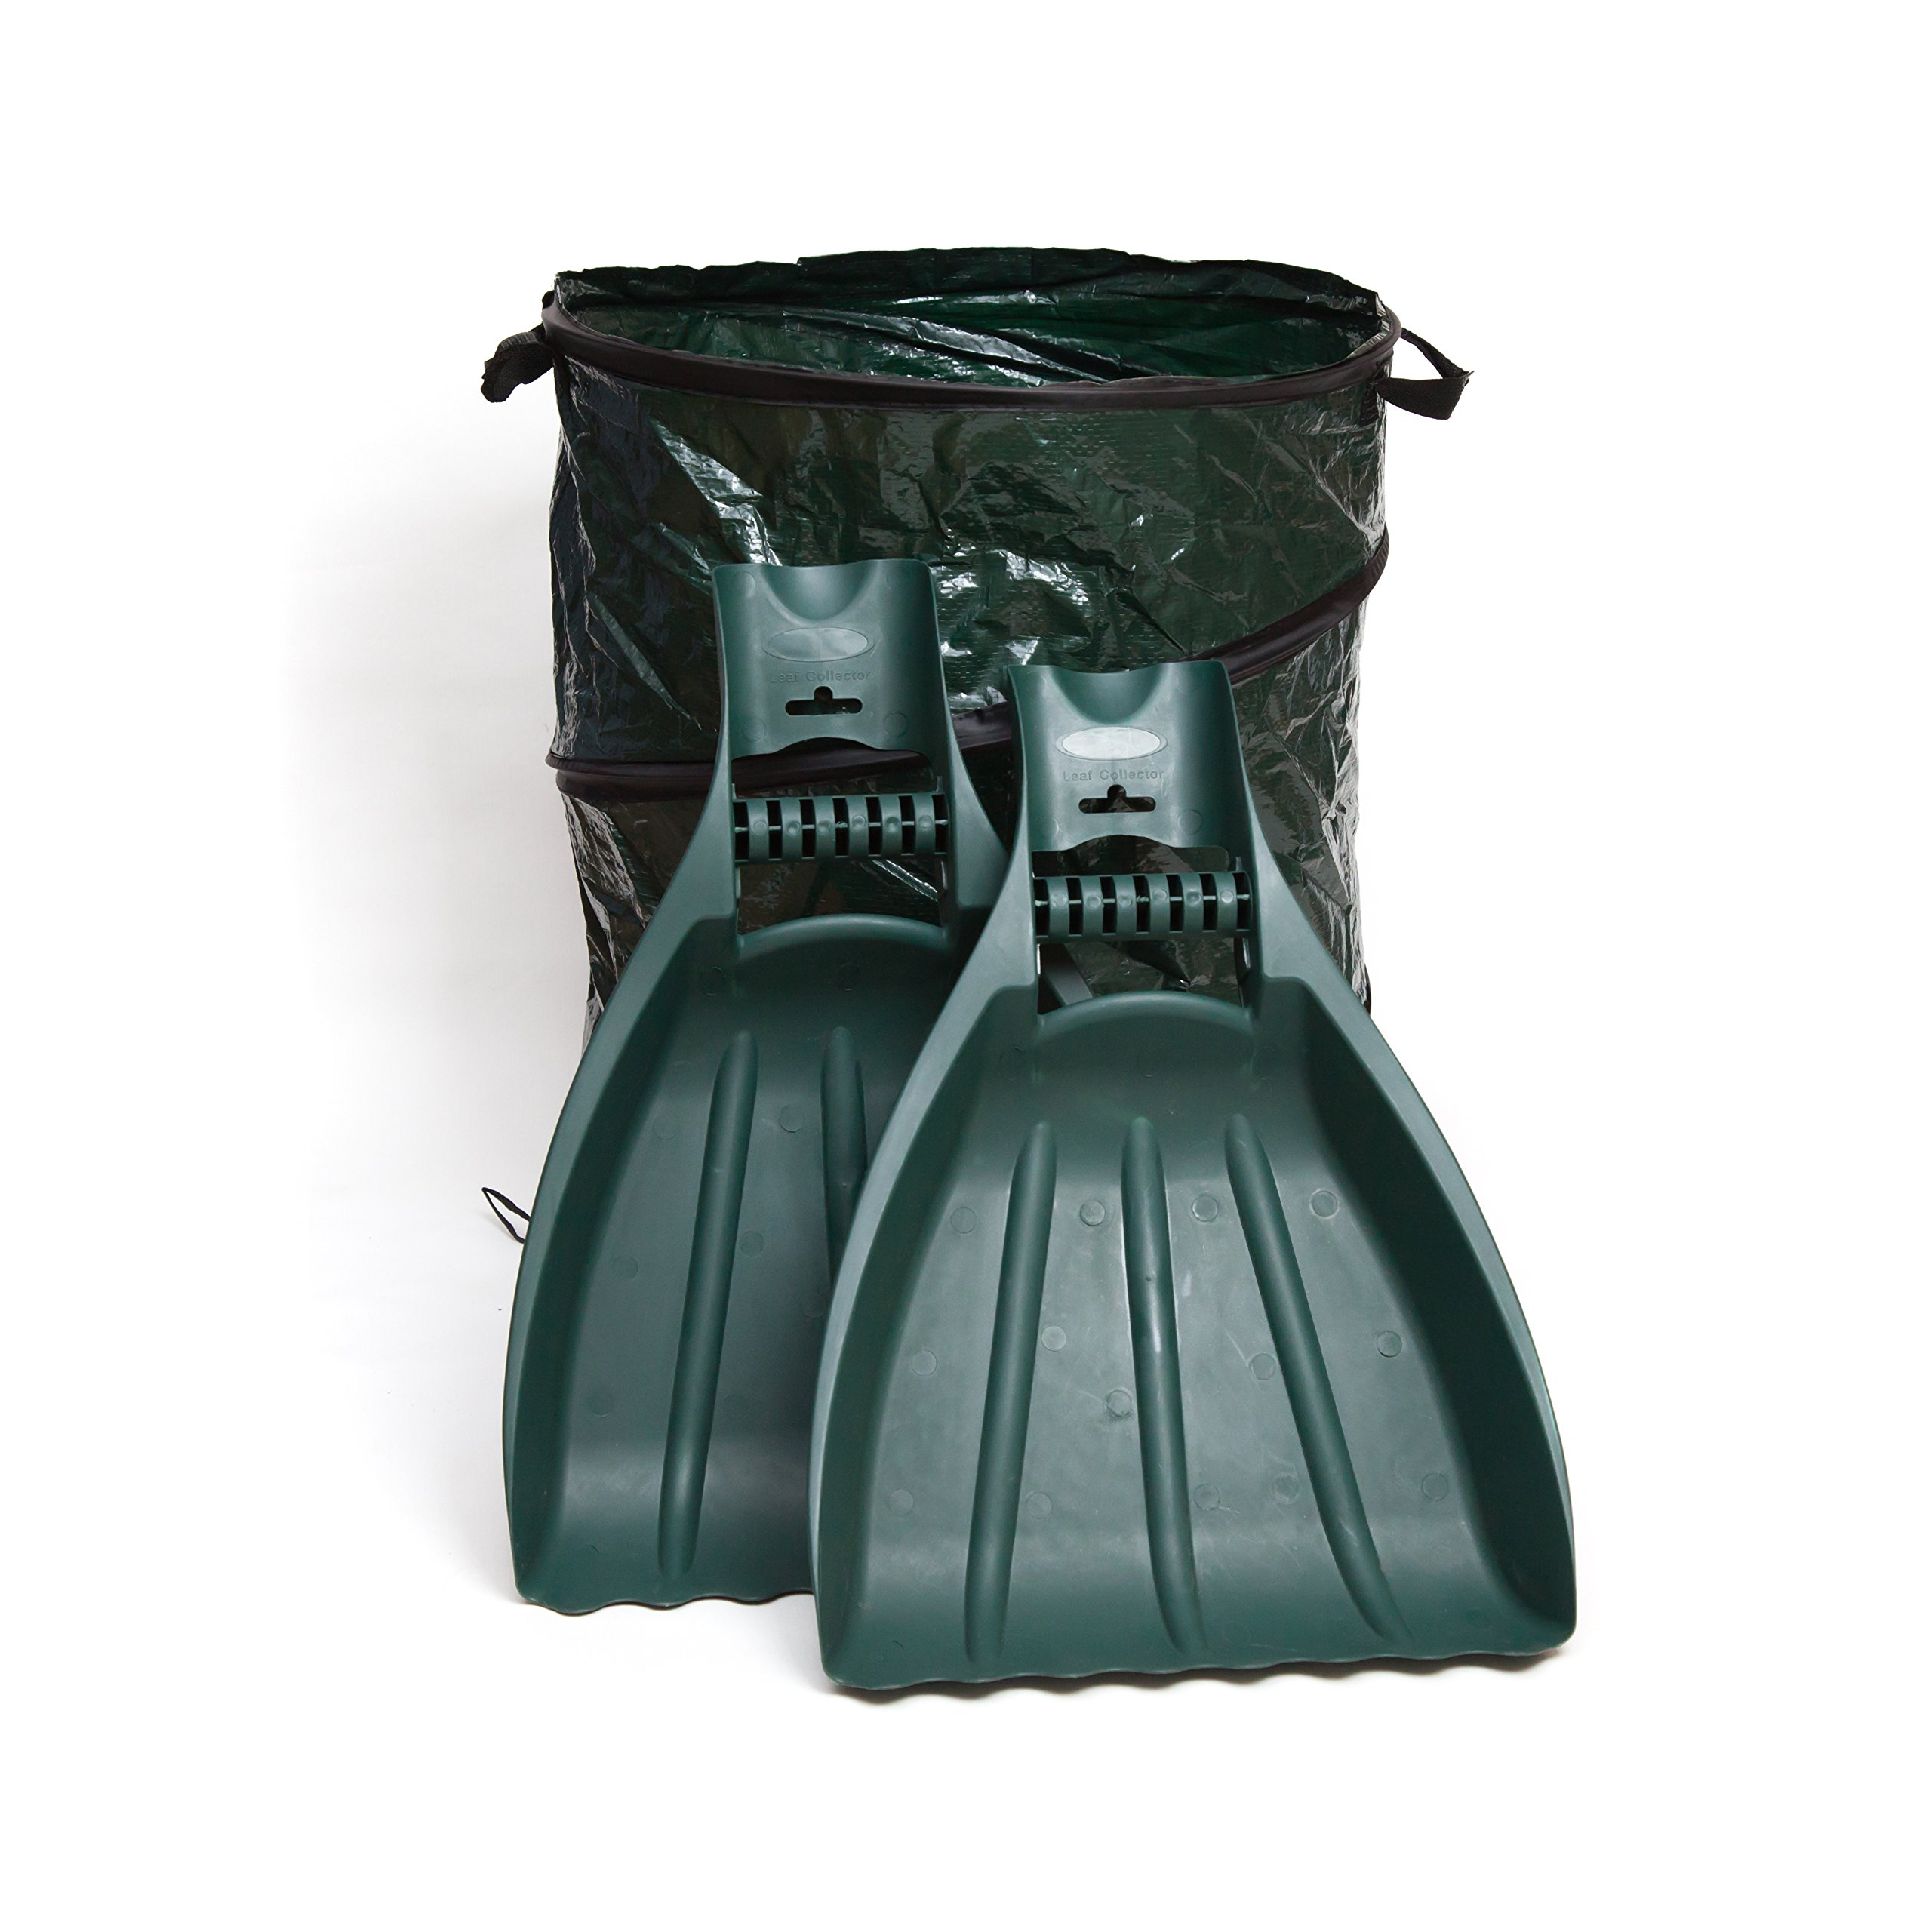 Kenley Leaf Scoops with Collapsible Yard Waste Garbage Bag Composting Bin – Leaf Hand Rakes for Leaves Grass Debris - Grabber Picker Tool for Garden or Lawn with Pop Up Composting Garbage Bag by Kenley (Image #1)